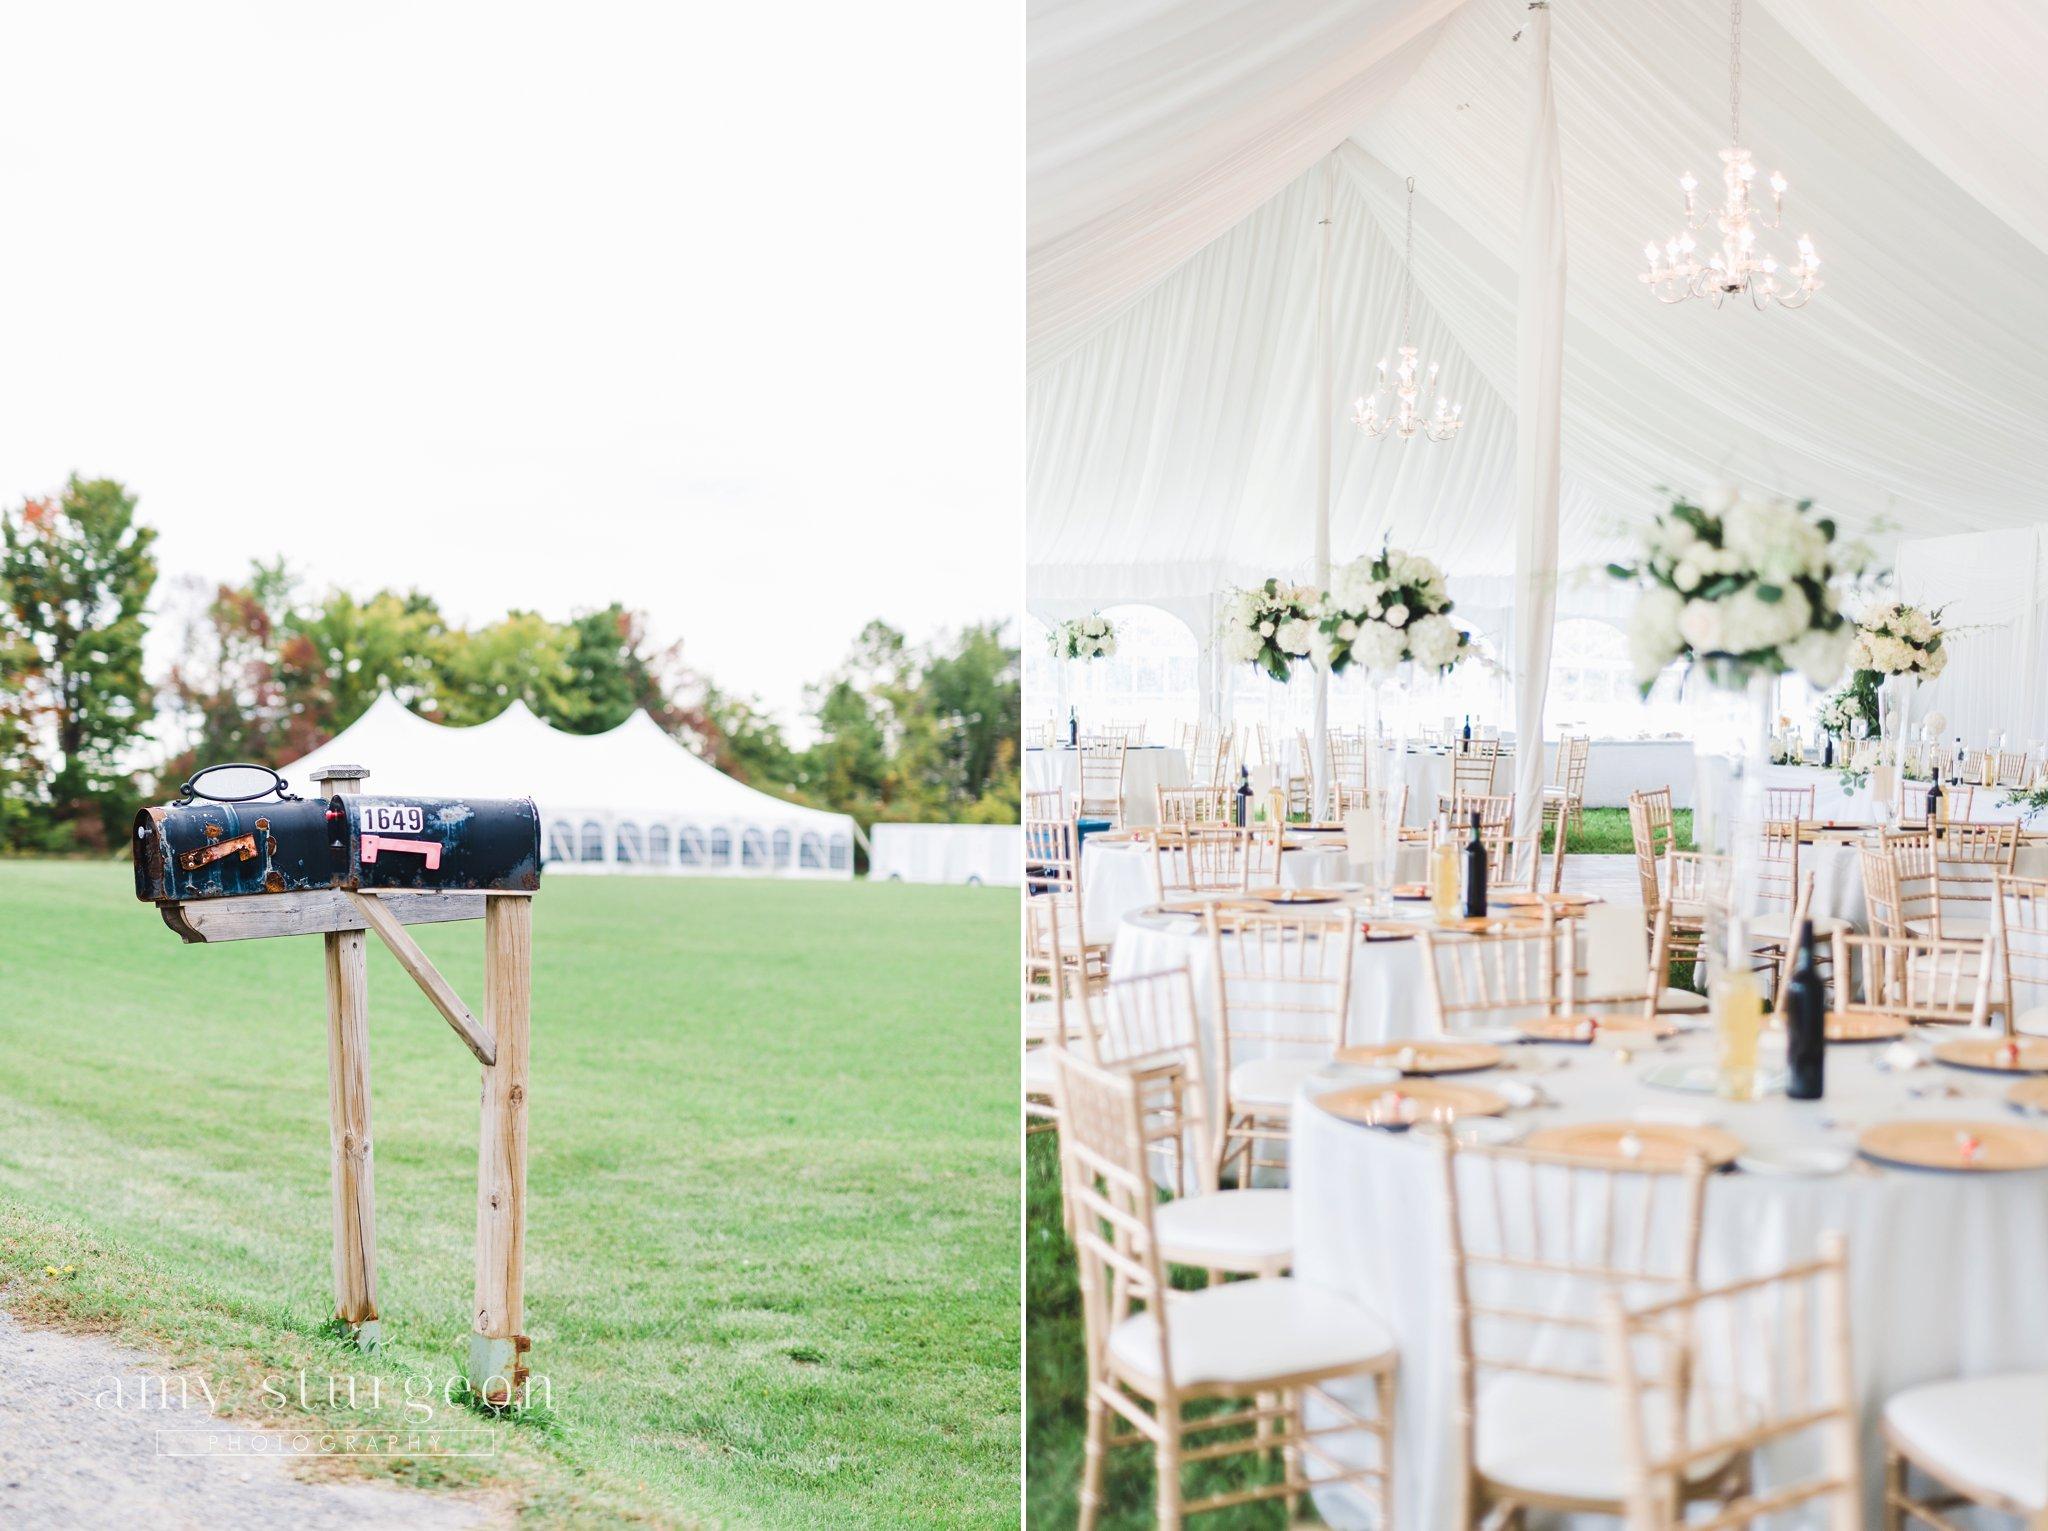 Gold chiavari chairs under the white draped ceiling tent at the alpaca farm wedding